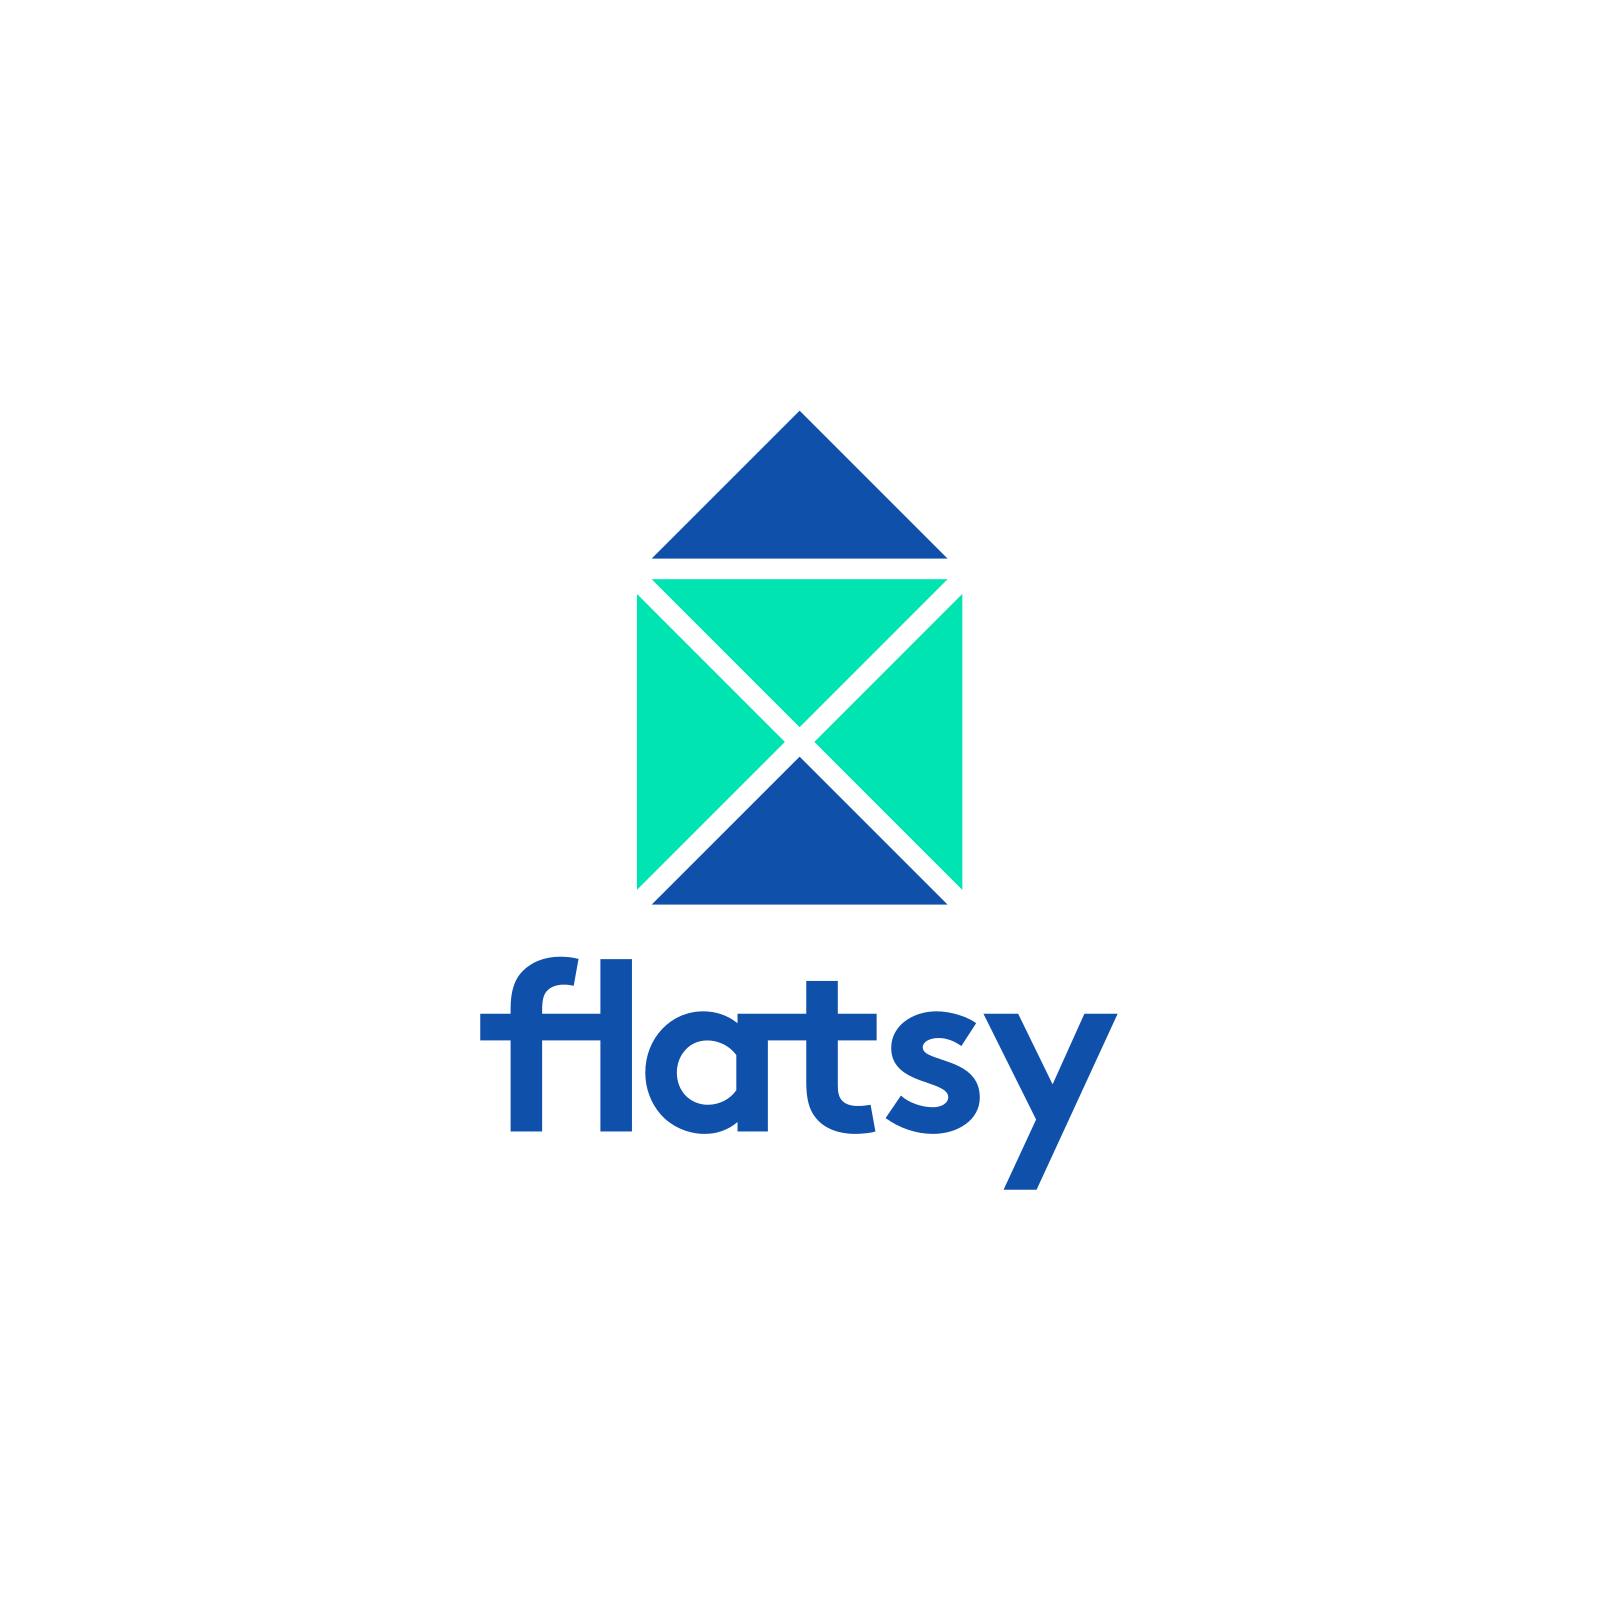 flatsy startup immobilier logo